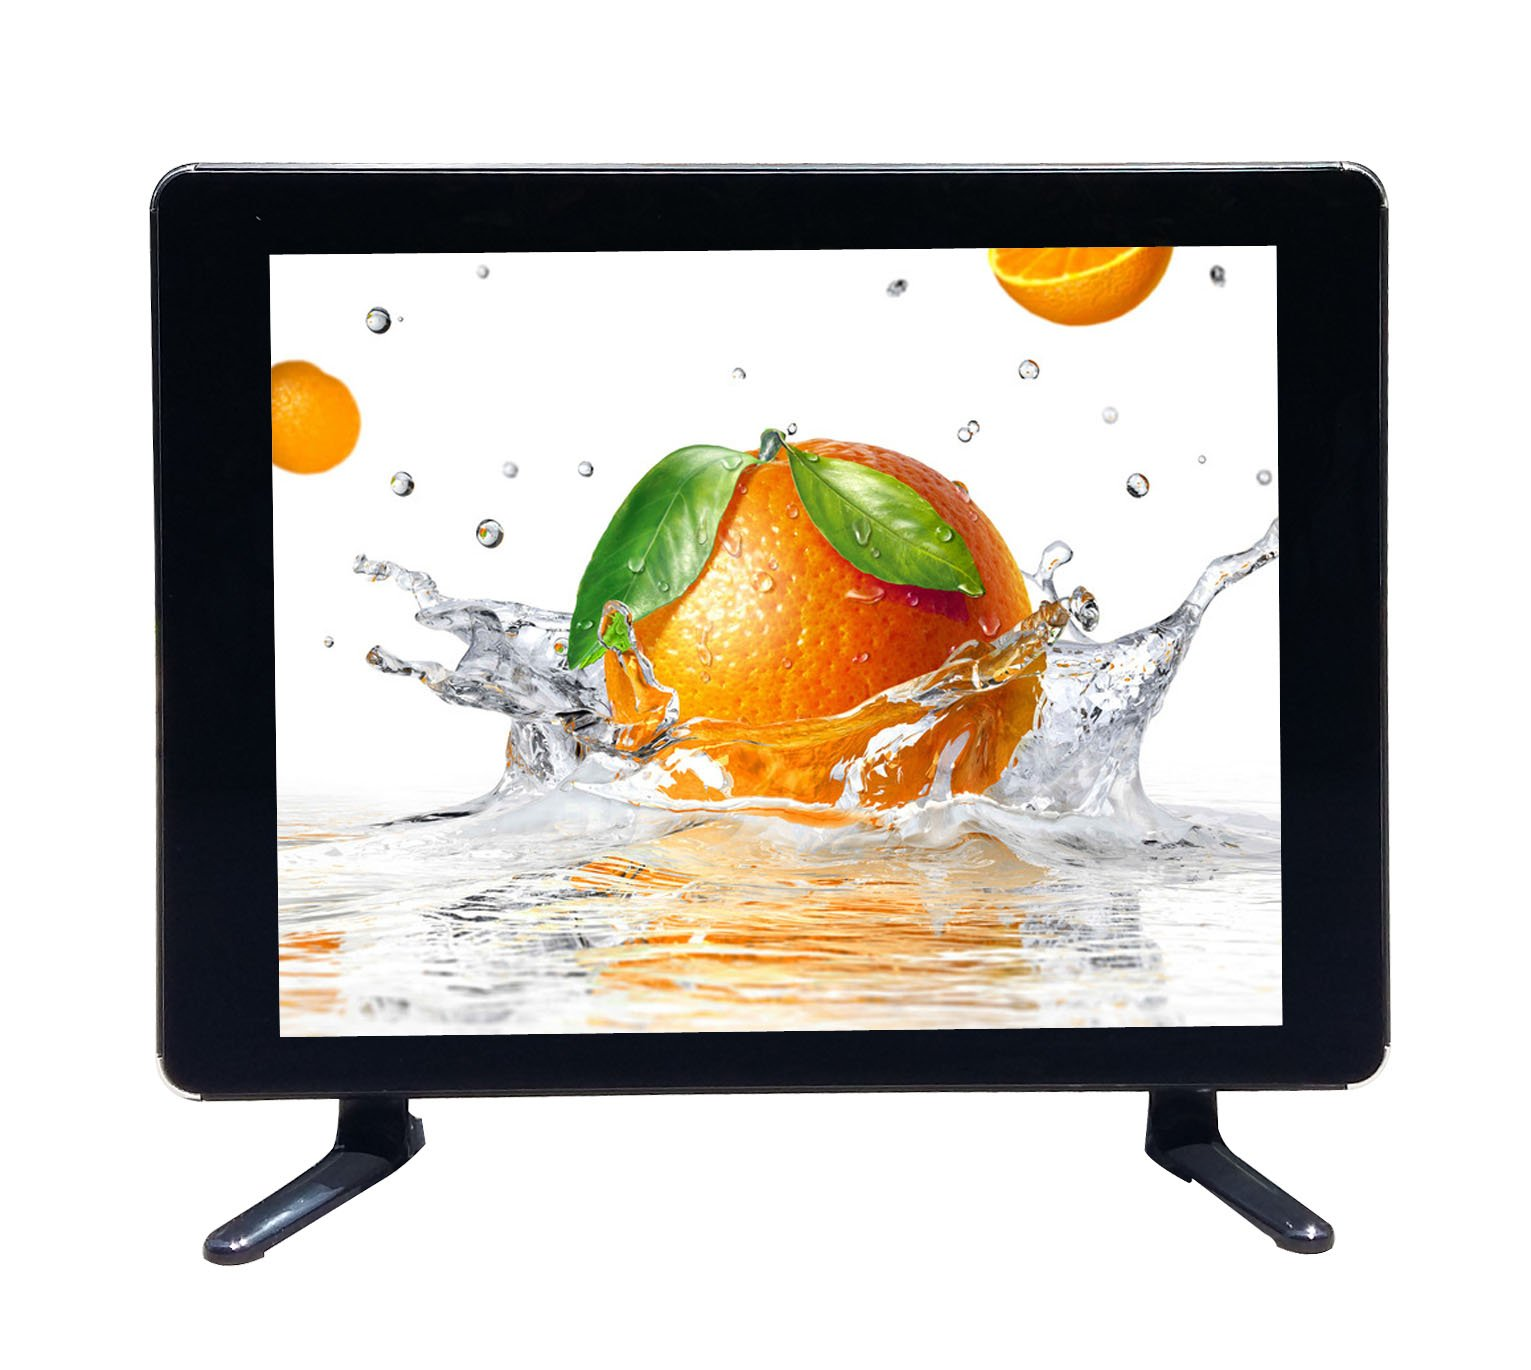 17 inch flat screen tv fashion design for tv screen-1